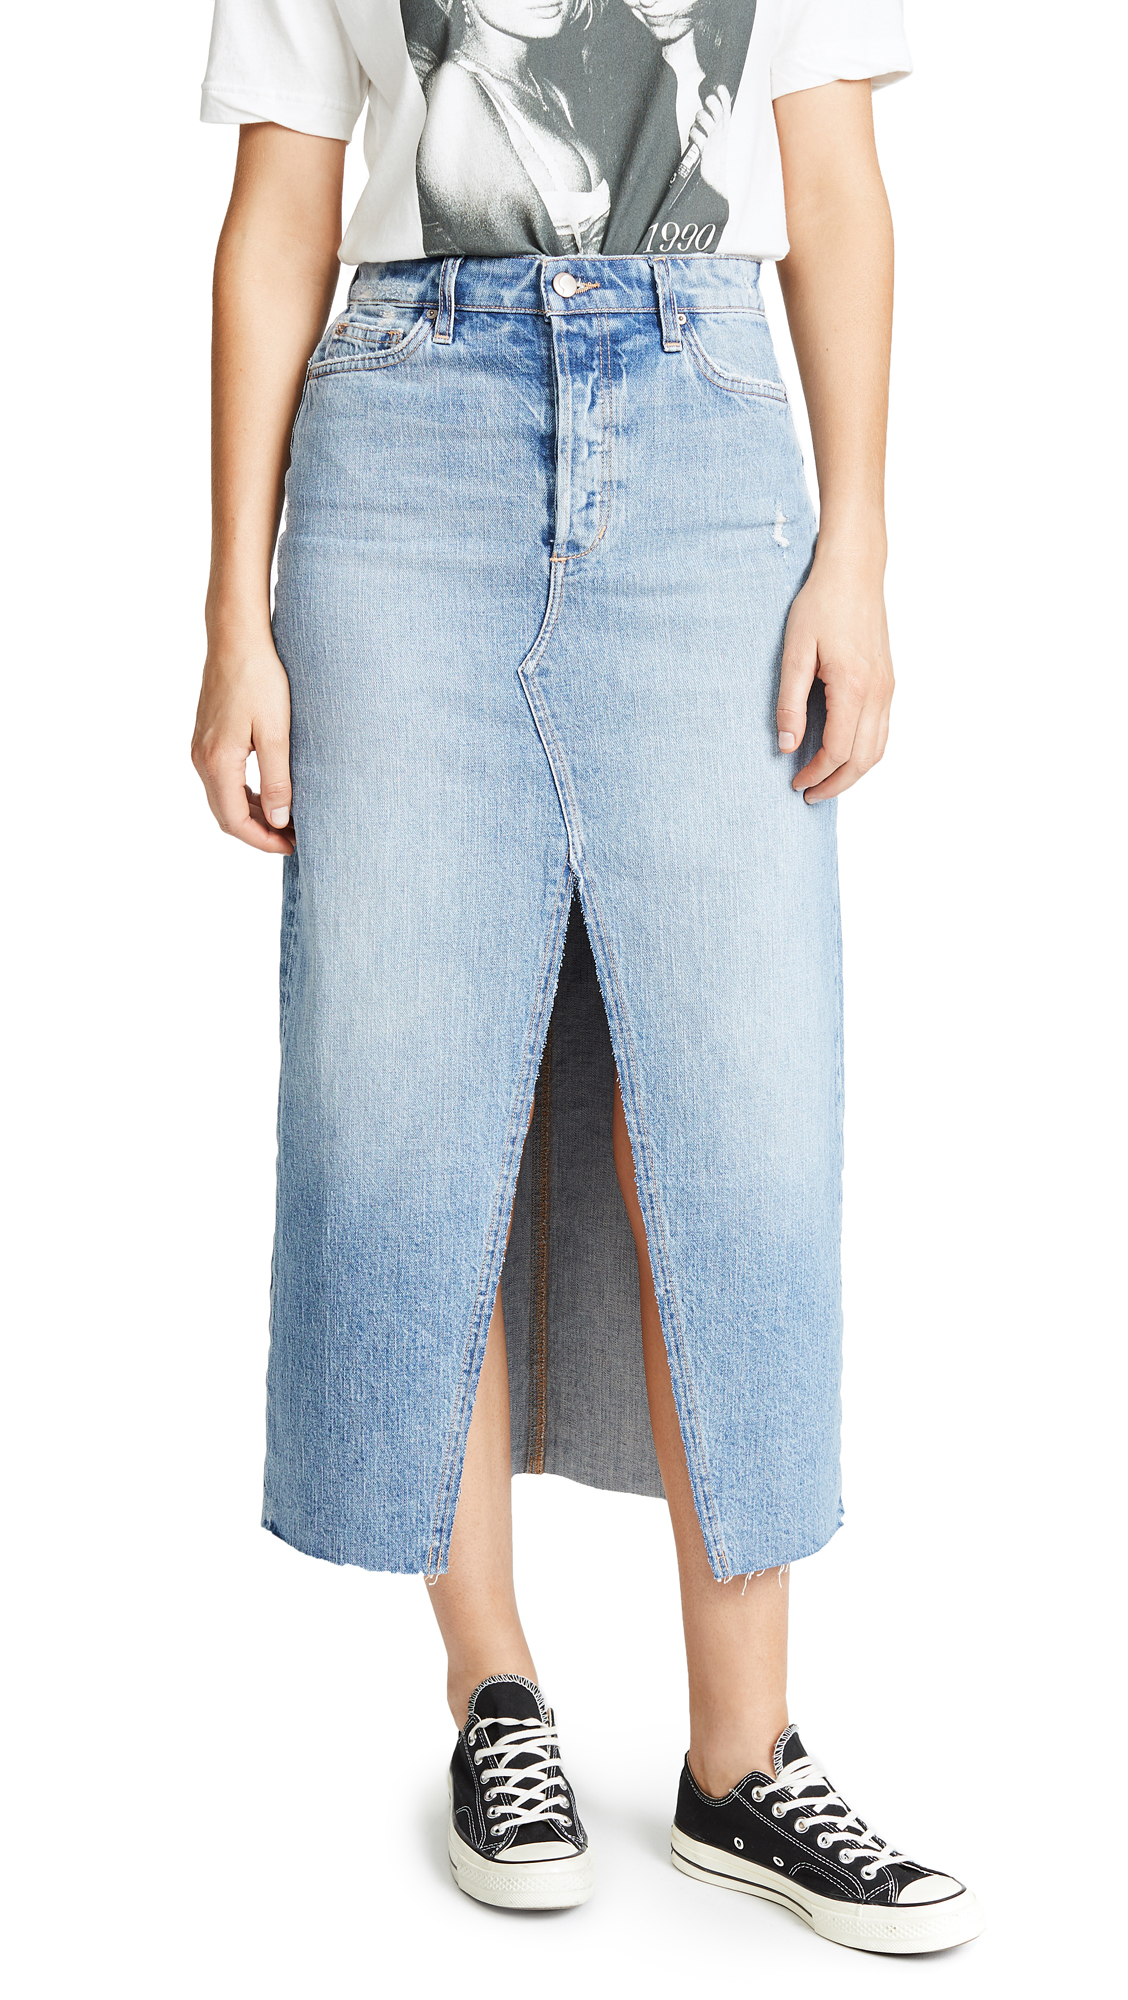 Joe's Jeans Elliza Long Denim Skirt In Elliza